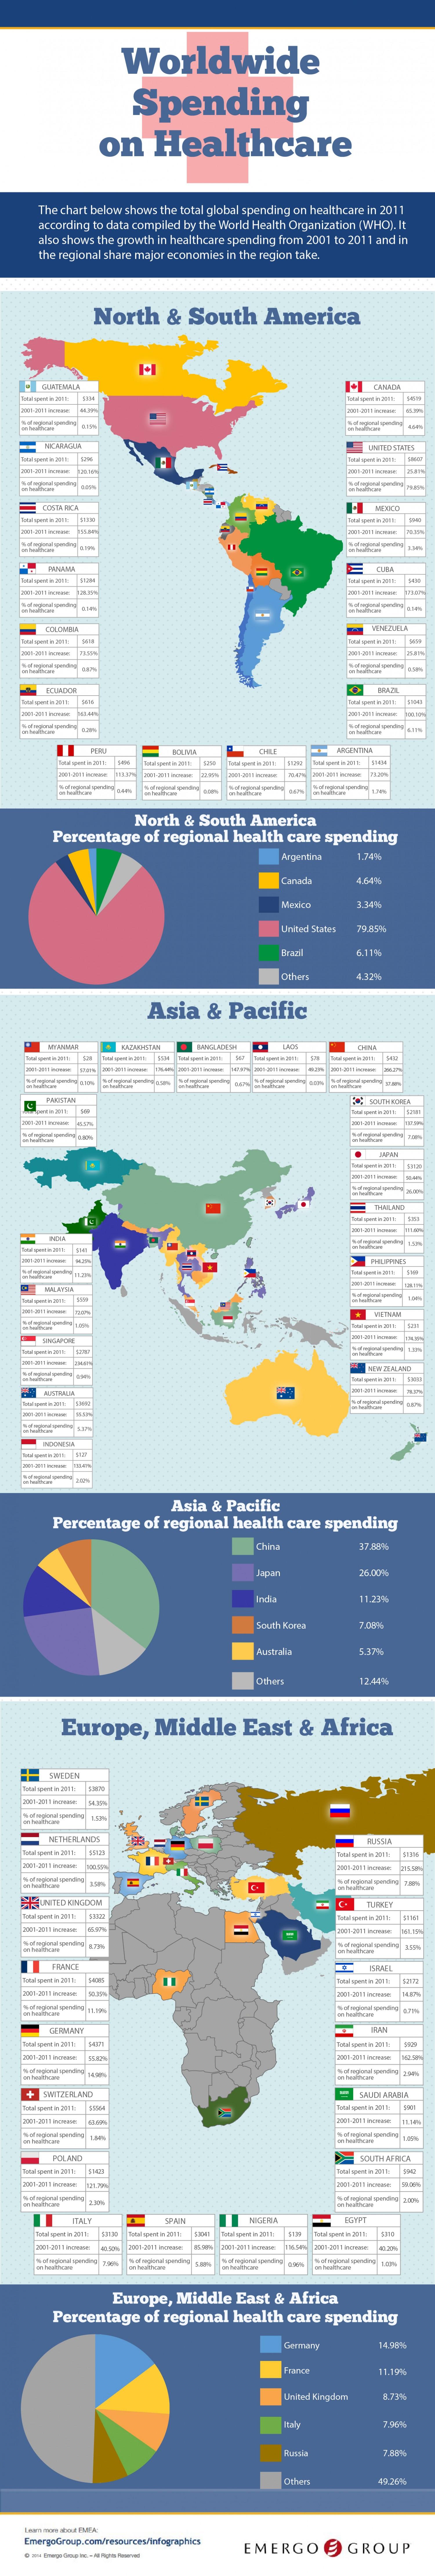 worldwide-spending-on-healthcare_52f51e81d610f_w1500